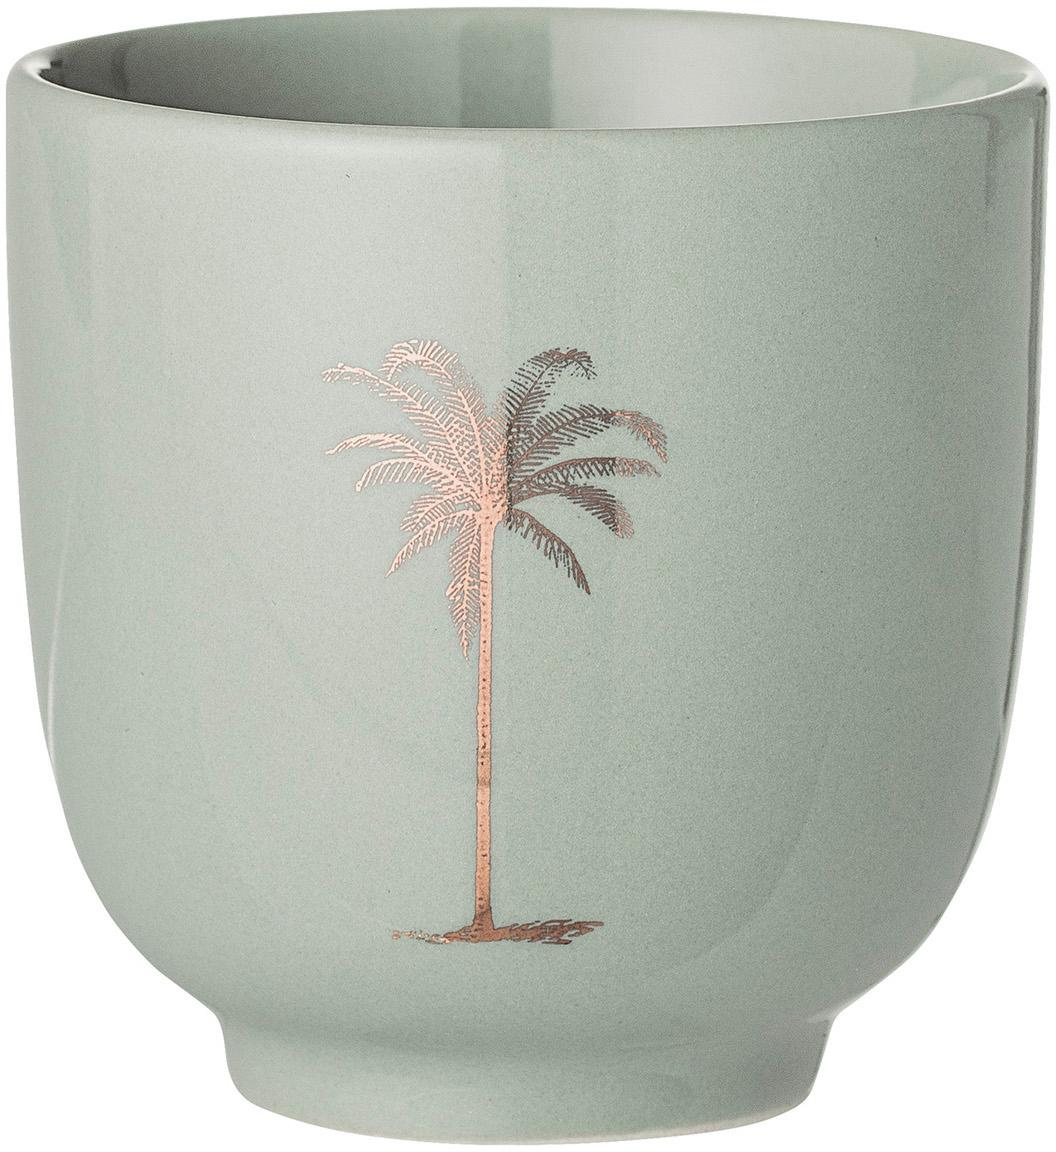 Becher Reese mit Palmen-Motiv, 2 Stück, Keramik, Resedagrün, Kupferfarben, Ø 7 x H 7 cm